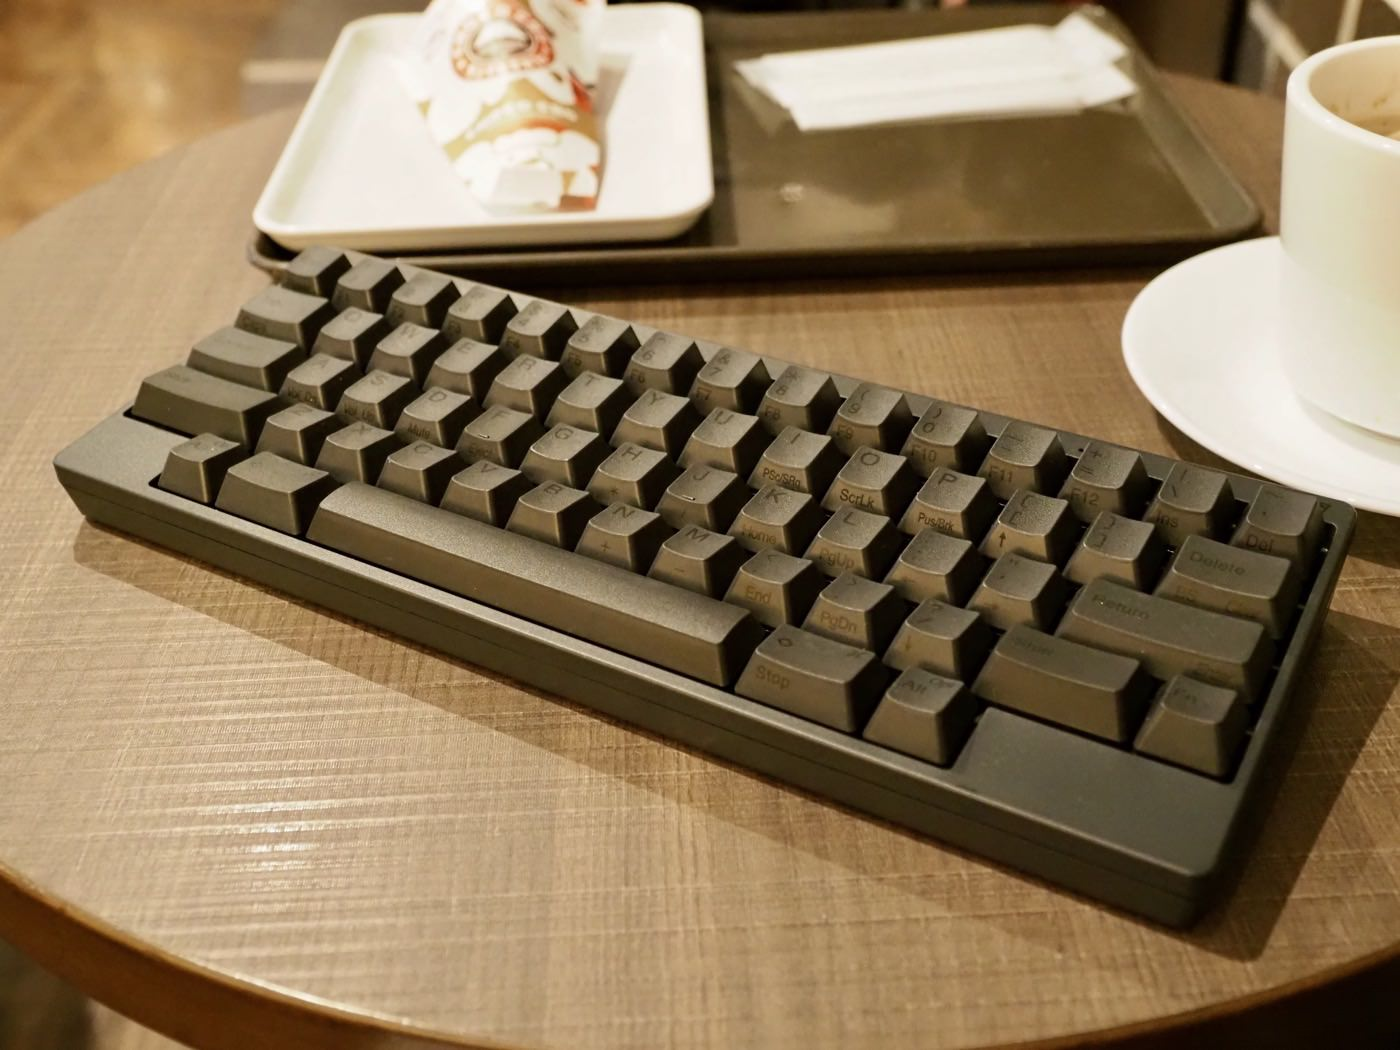 Happy hacking keyboard hybrid type s 00009